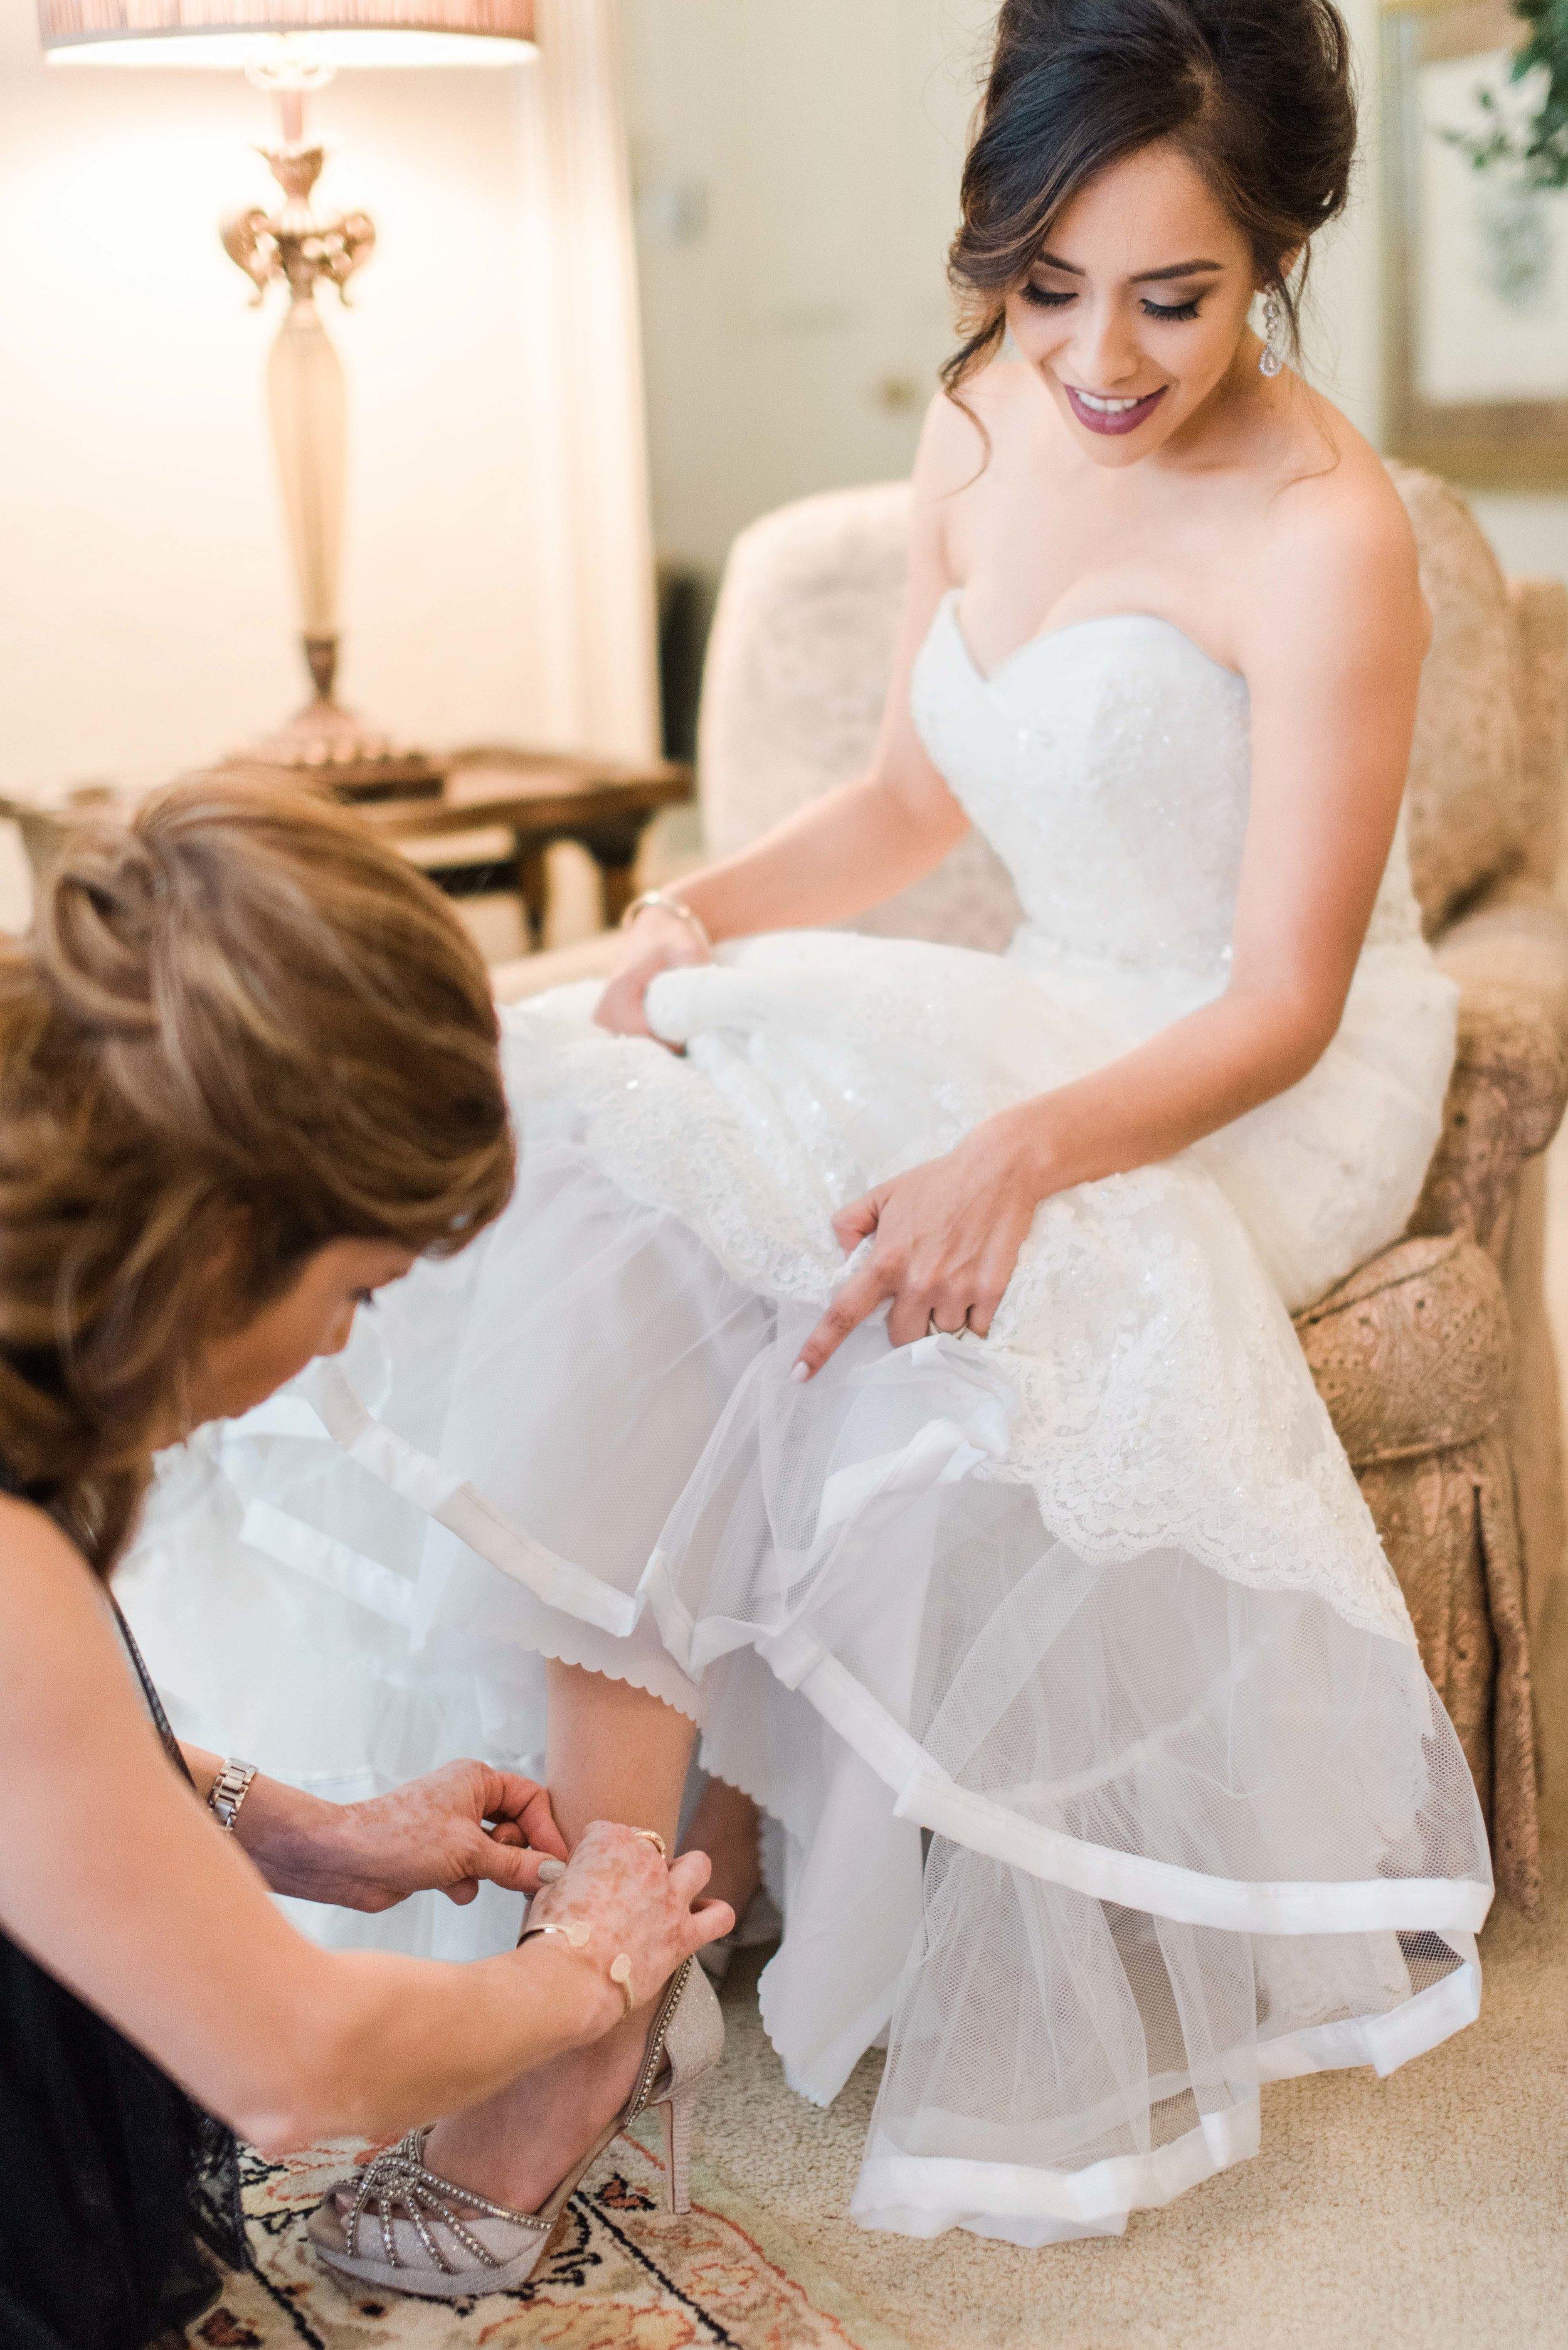 Houston-Wedding-Photography-St.-Anne-Catholic-Church-Houston-Wedding-The-Bell-Tower-on-34th-reception-wedding-film-5.jpg